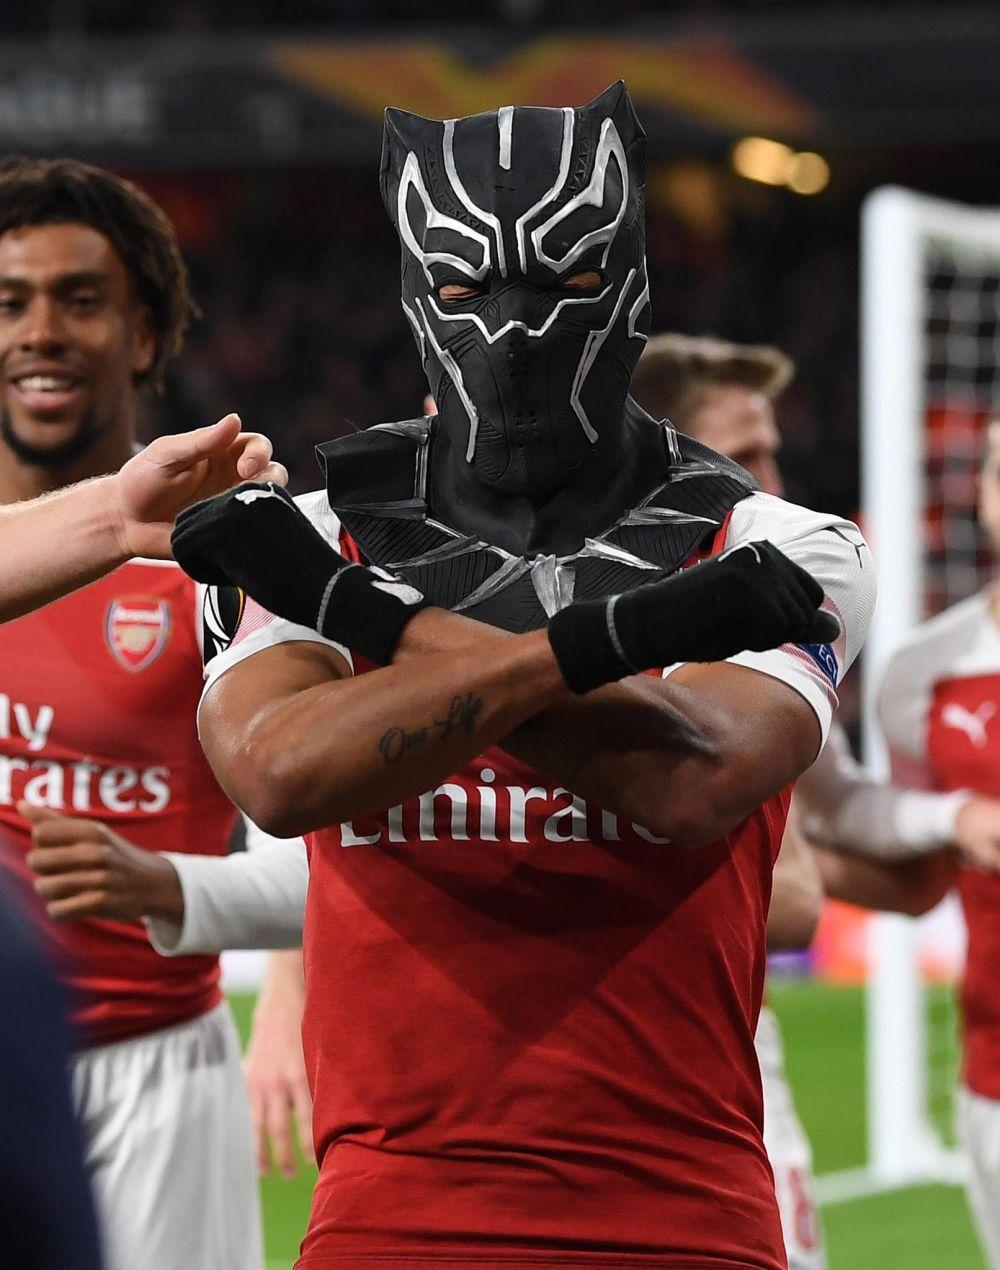 Aubameyang a marcat cu Liverpool! Omagiu emotionant pentru Chadwick Boseman dupa gol! AICI: Ce se intampla in Arsenal 1-0 Liverpool